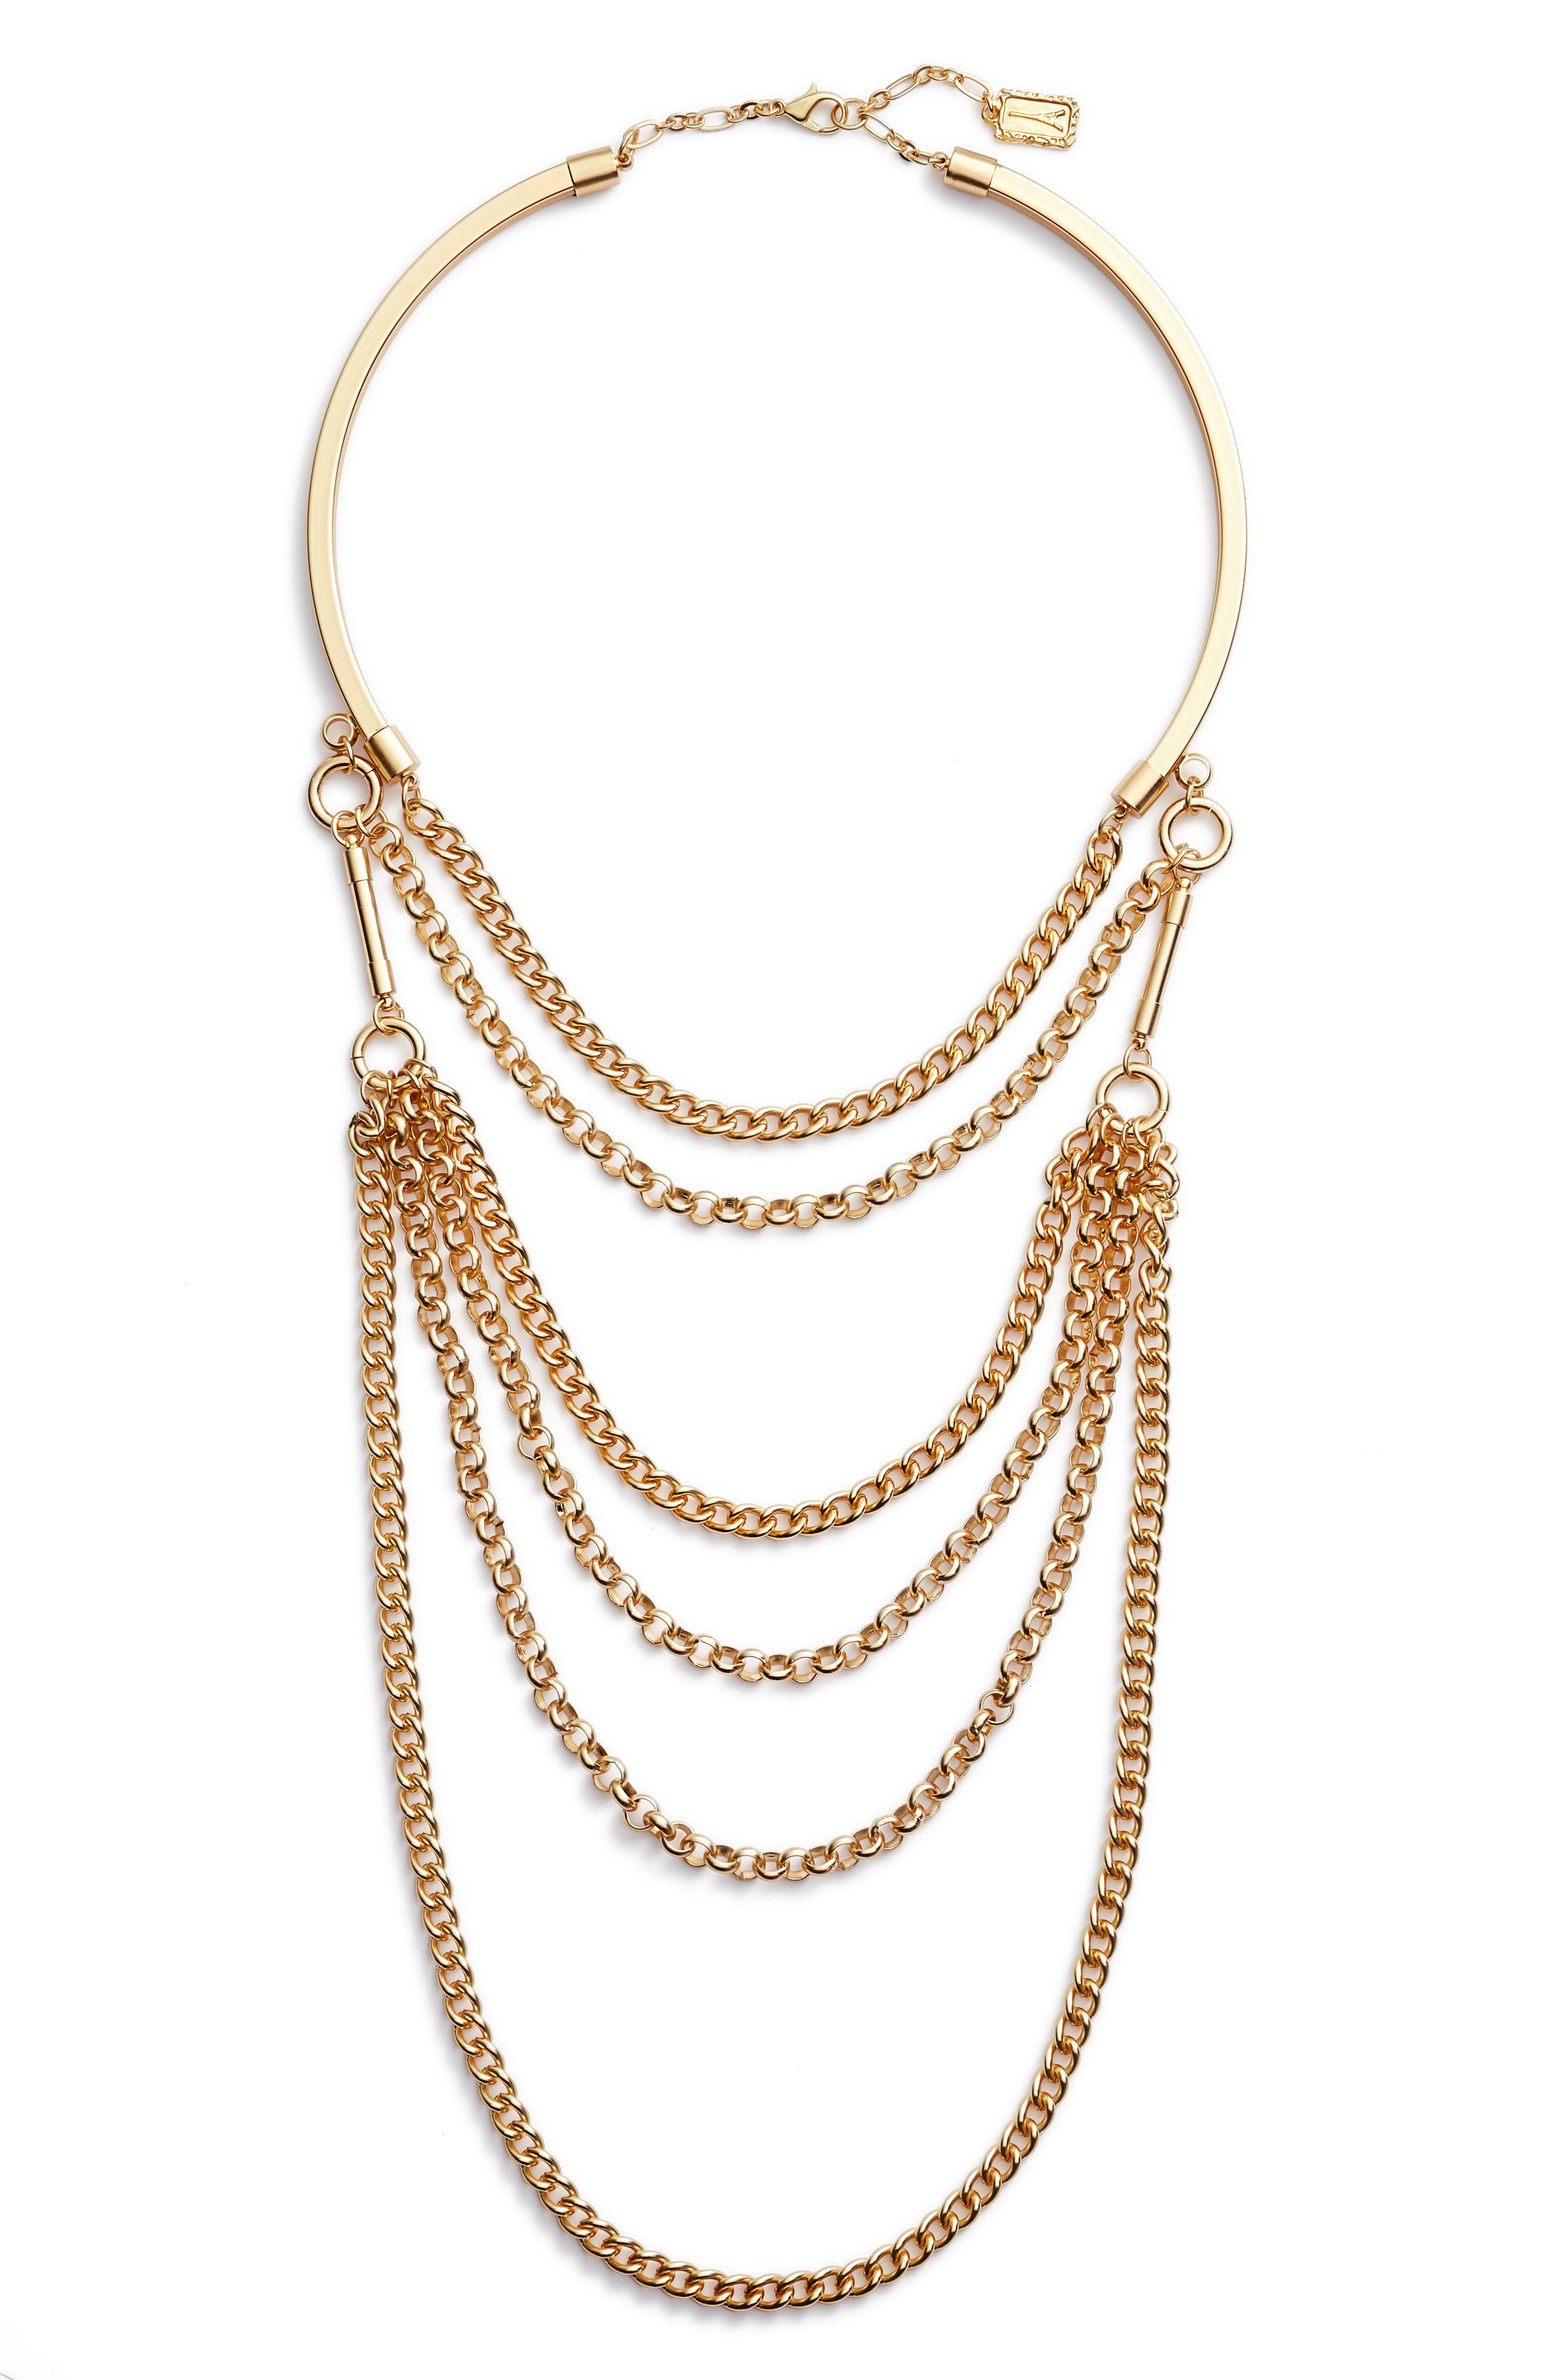 Karine Sultan Elia Layered Necklace